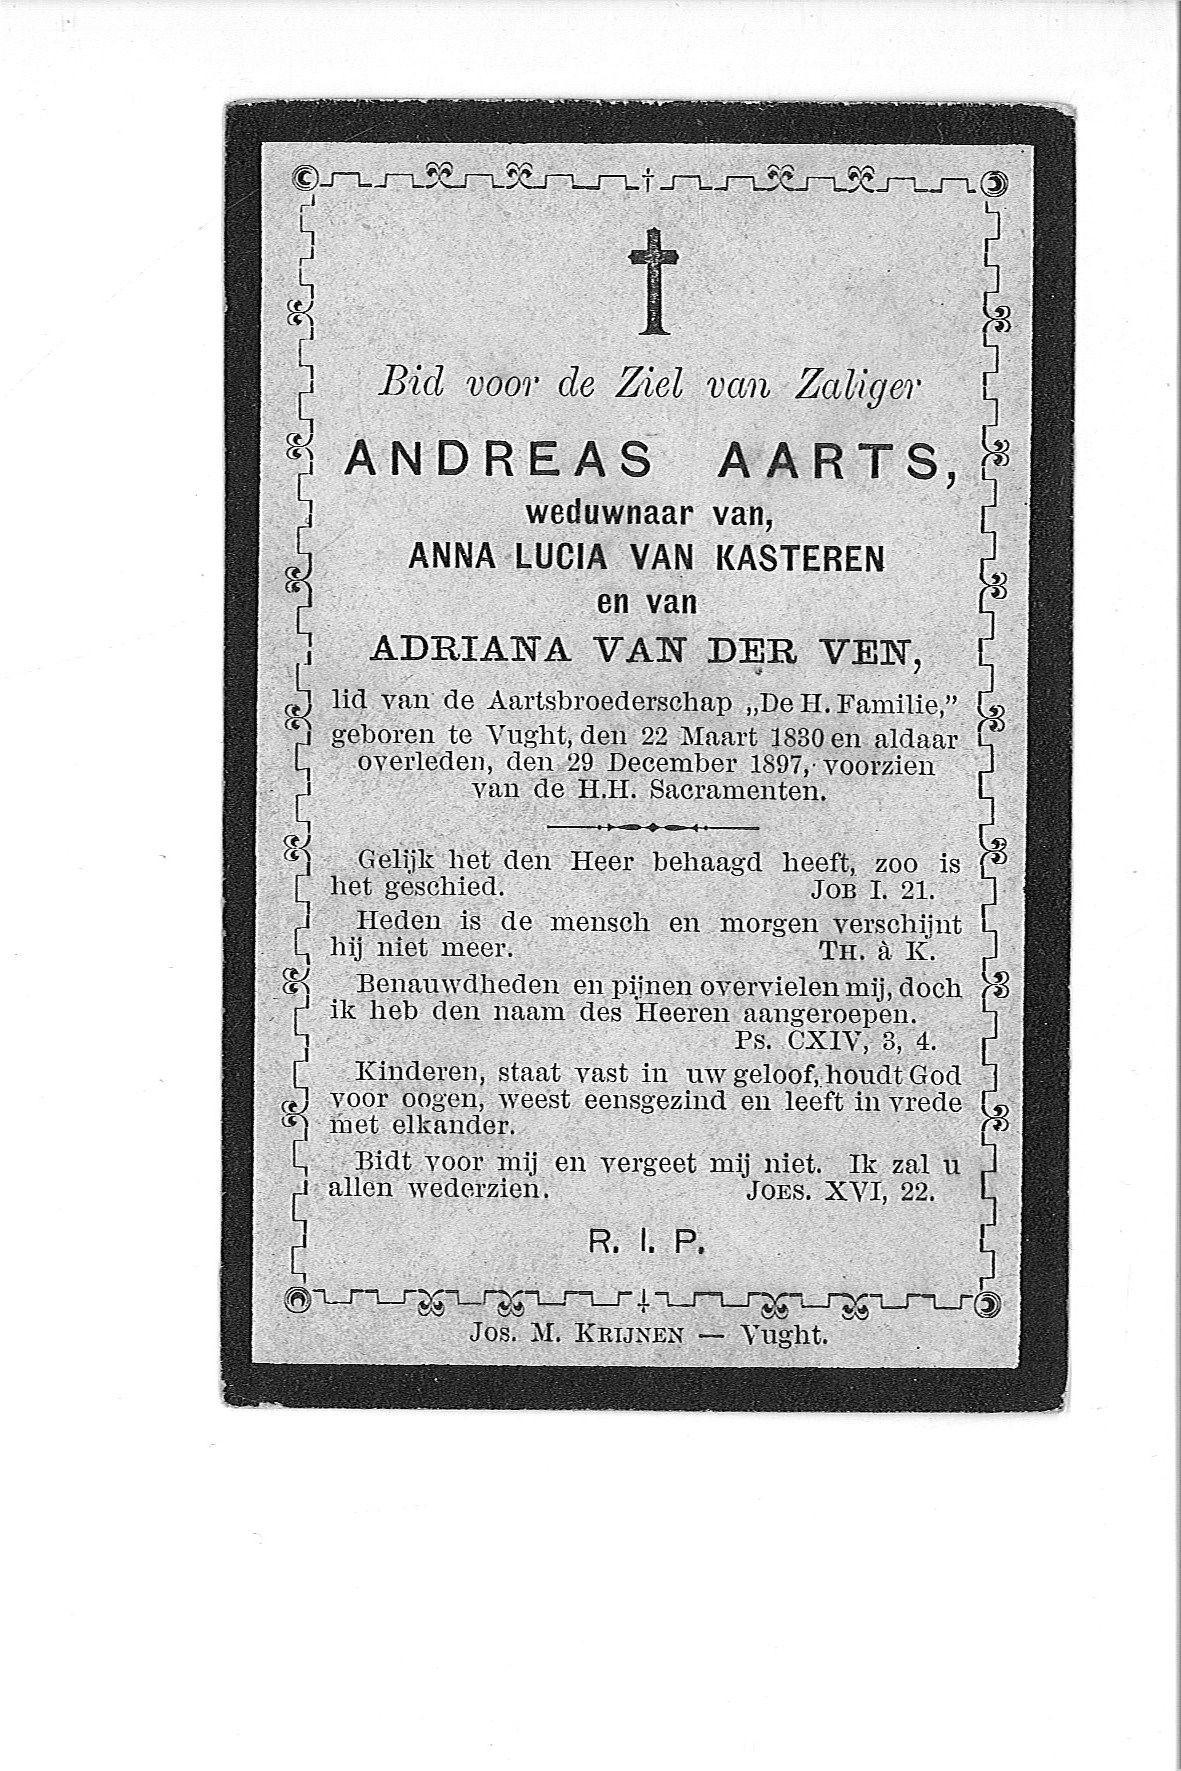 andreas(1897)20090105132822_00001.jpg